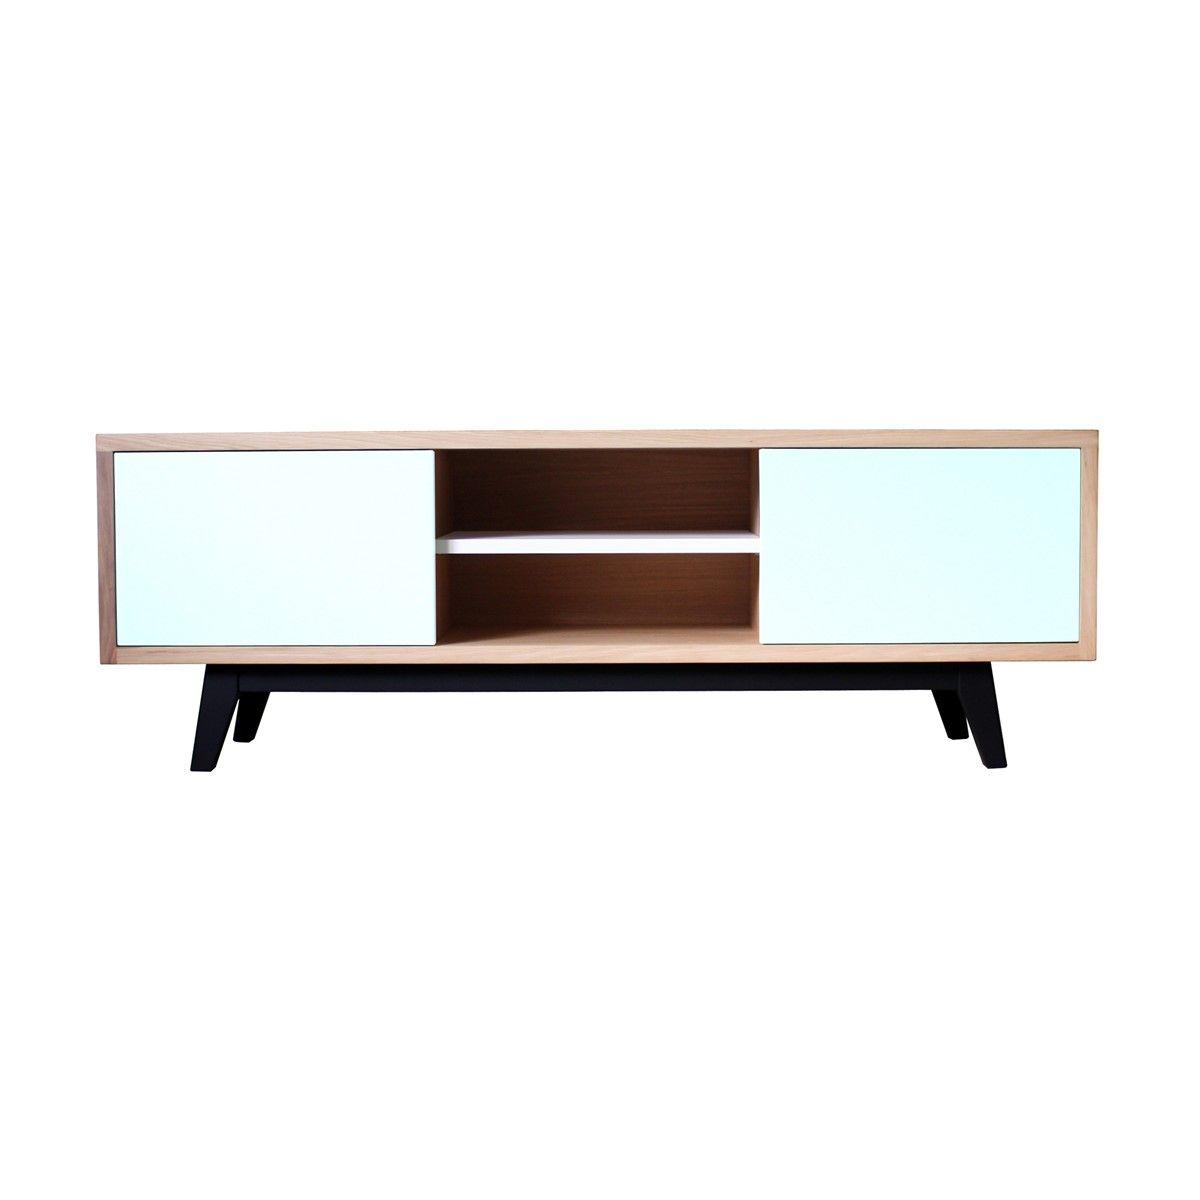 design et fabrication 100 franais httpwwwitinerairebiseup 2854 buffet tv vintage chene massif blanchi et laquehtml